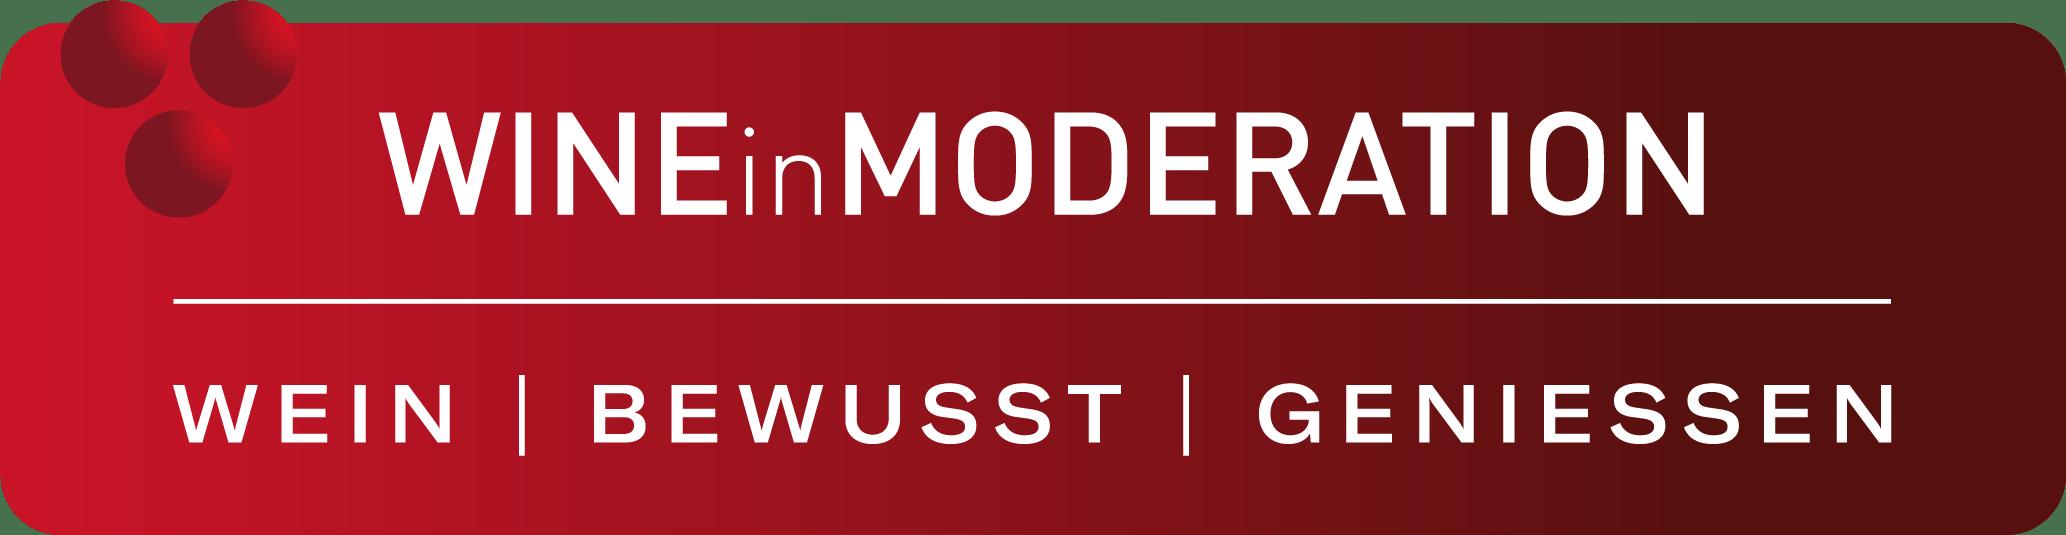 WiM_DE_Baseline inside_Gradient_RGB